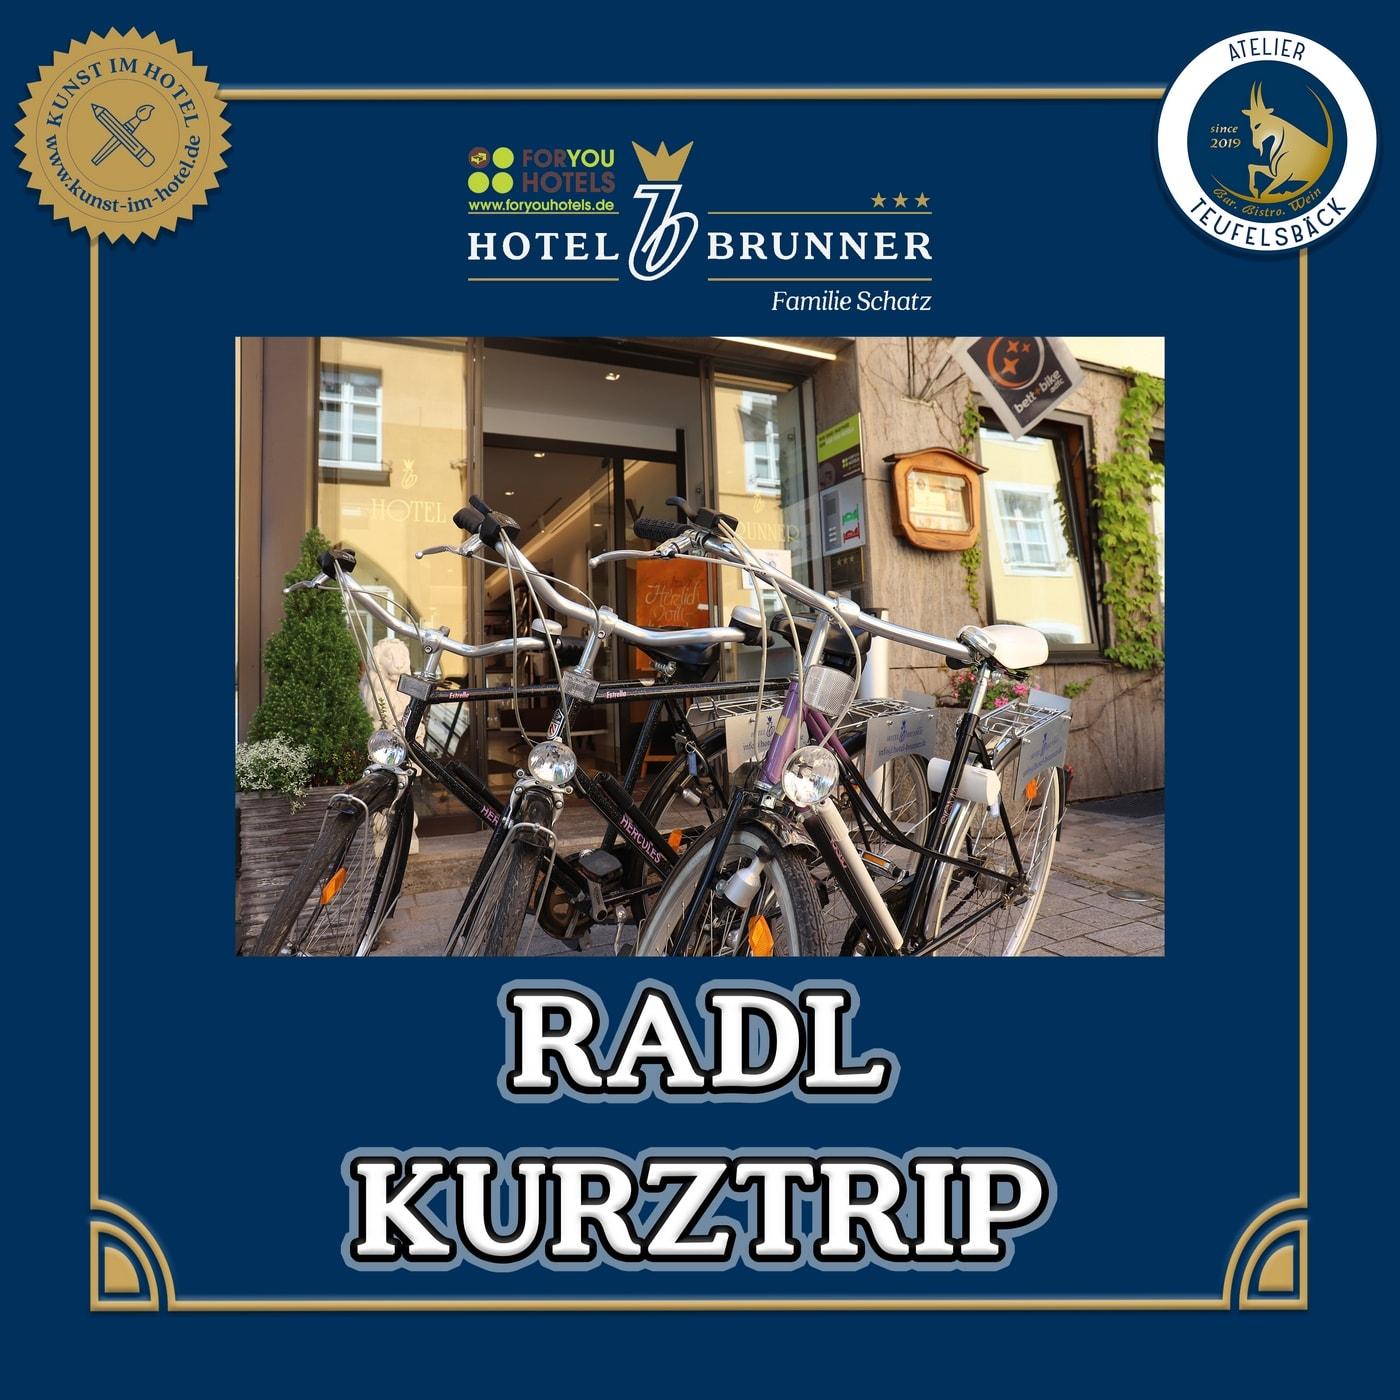 square-bike-short-trip-offer